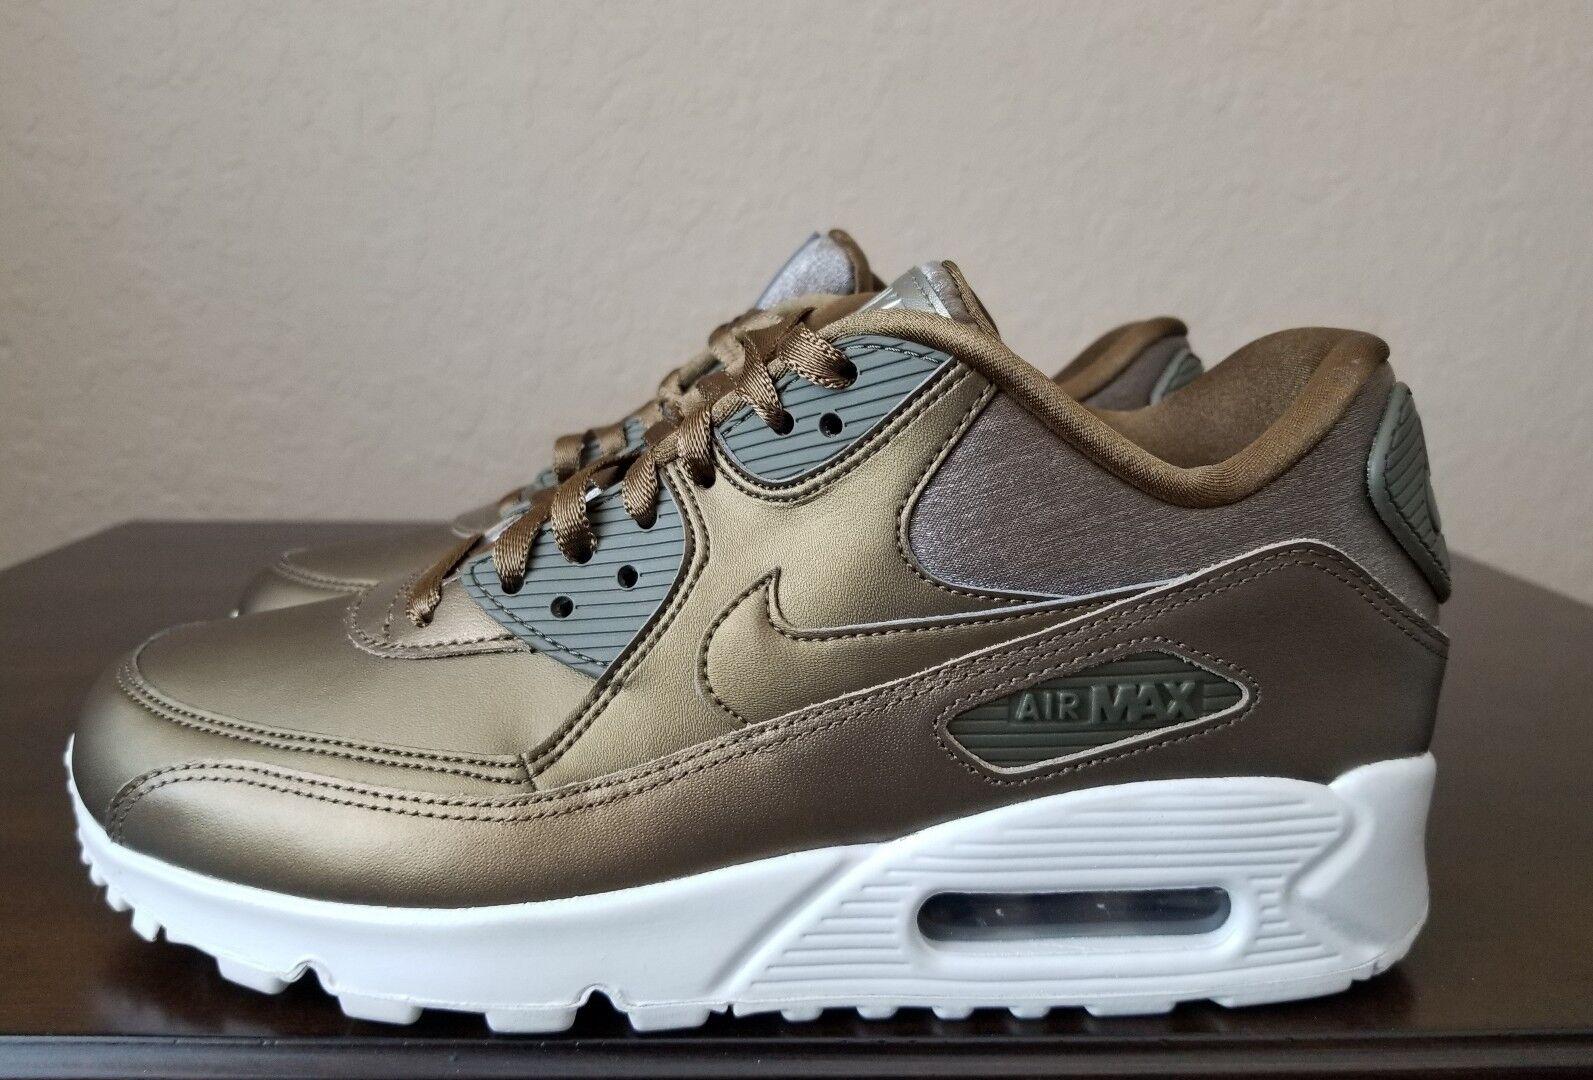 ��NEW Nike Air Max 90 Premium Running Shoes 896497-902 Metallic Womens Size 8